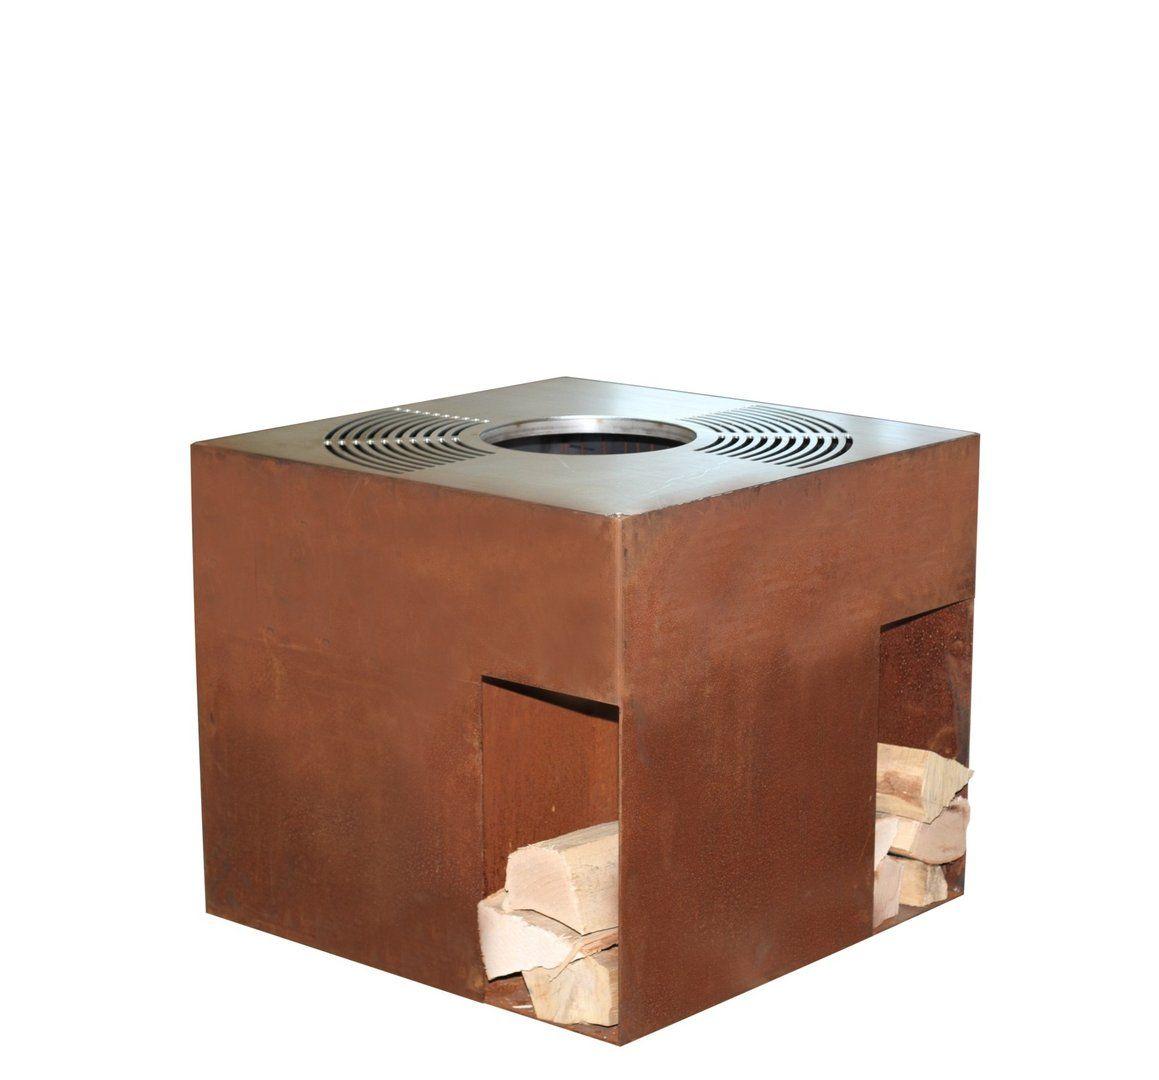 Feuerstelle Quadro Corten | Cucina outdoor | BBQ grill ...